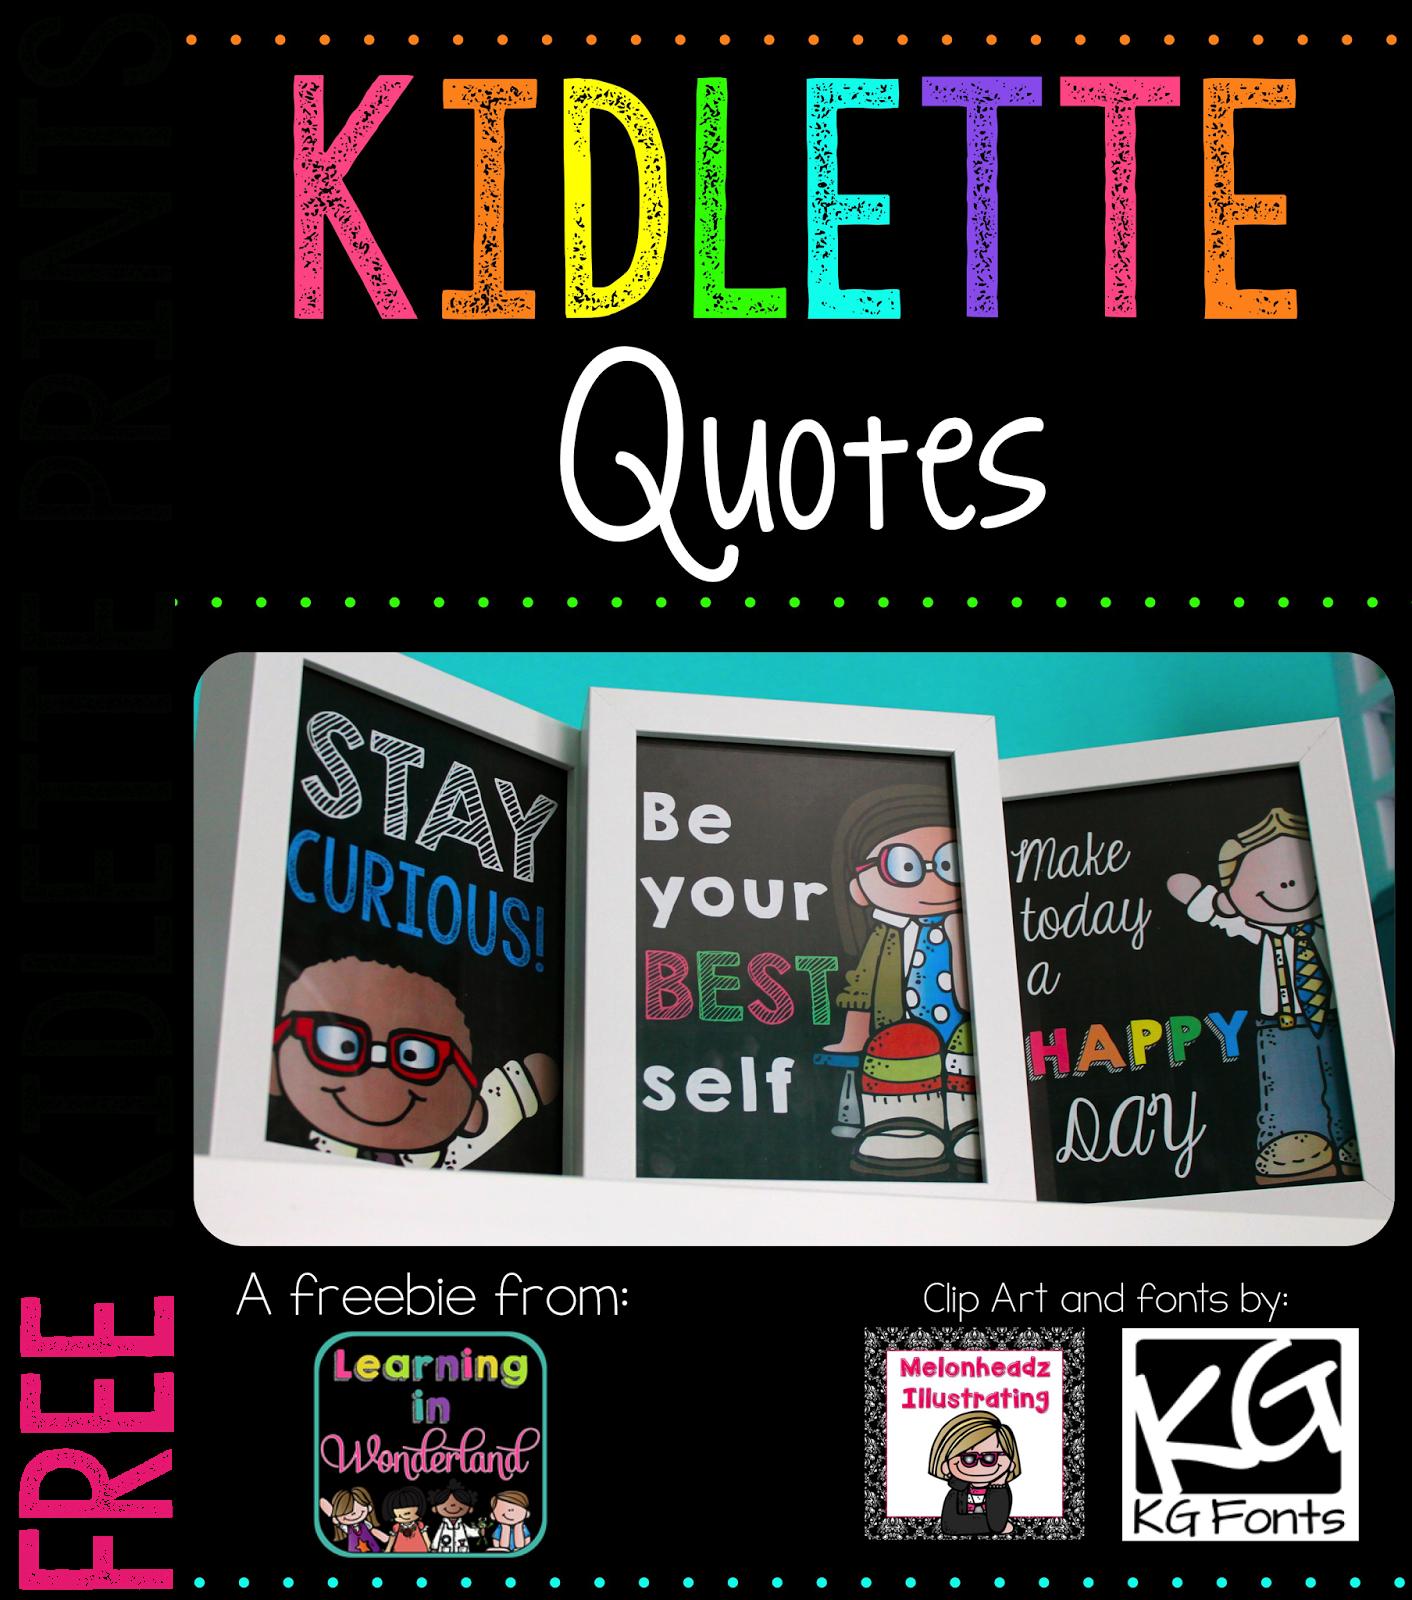 http://www.teacherspayteachers.com/Product/Kidlette-Quotes-Freebie-1349230